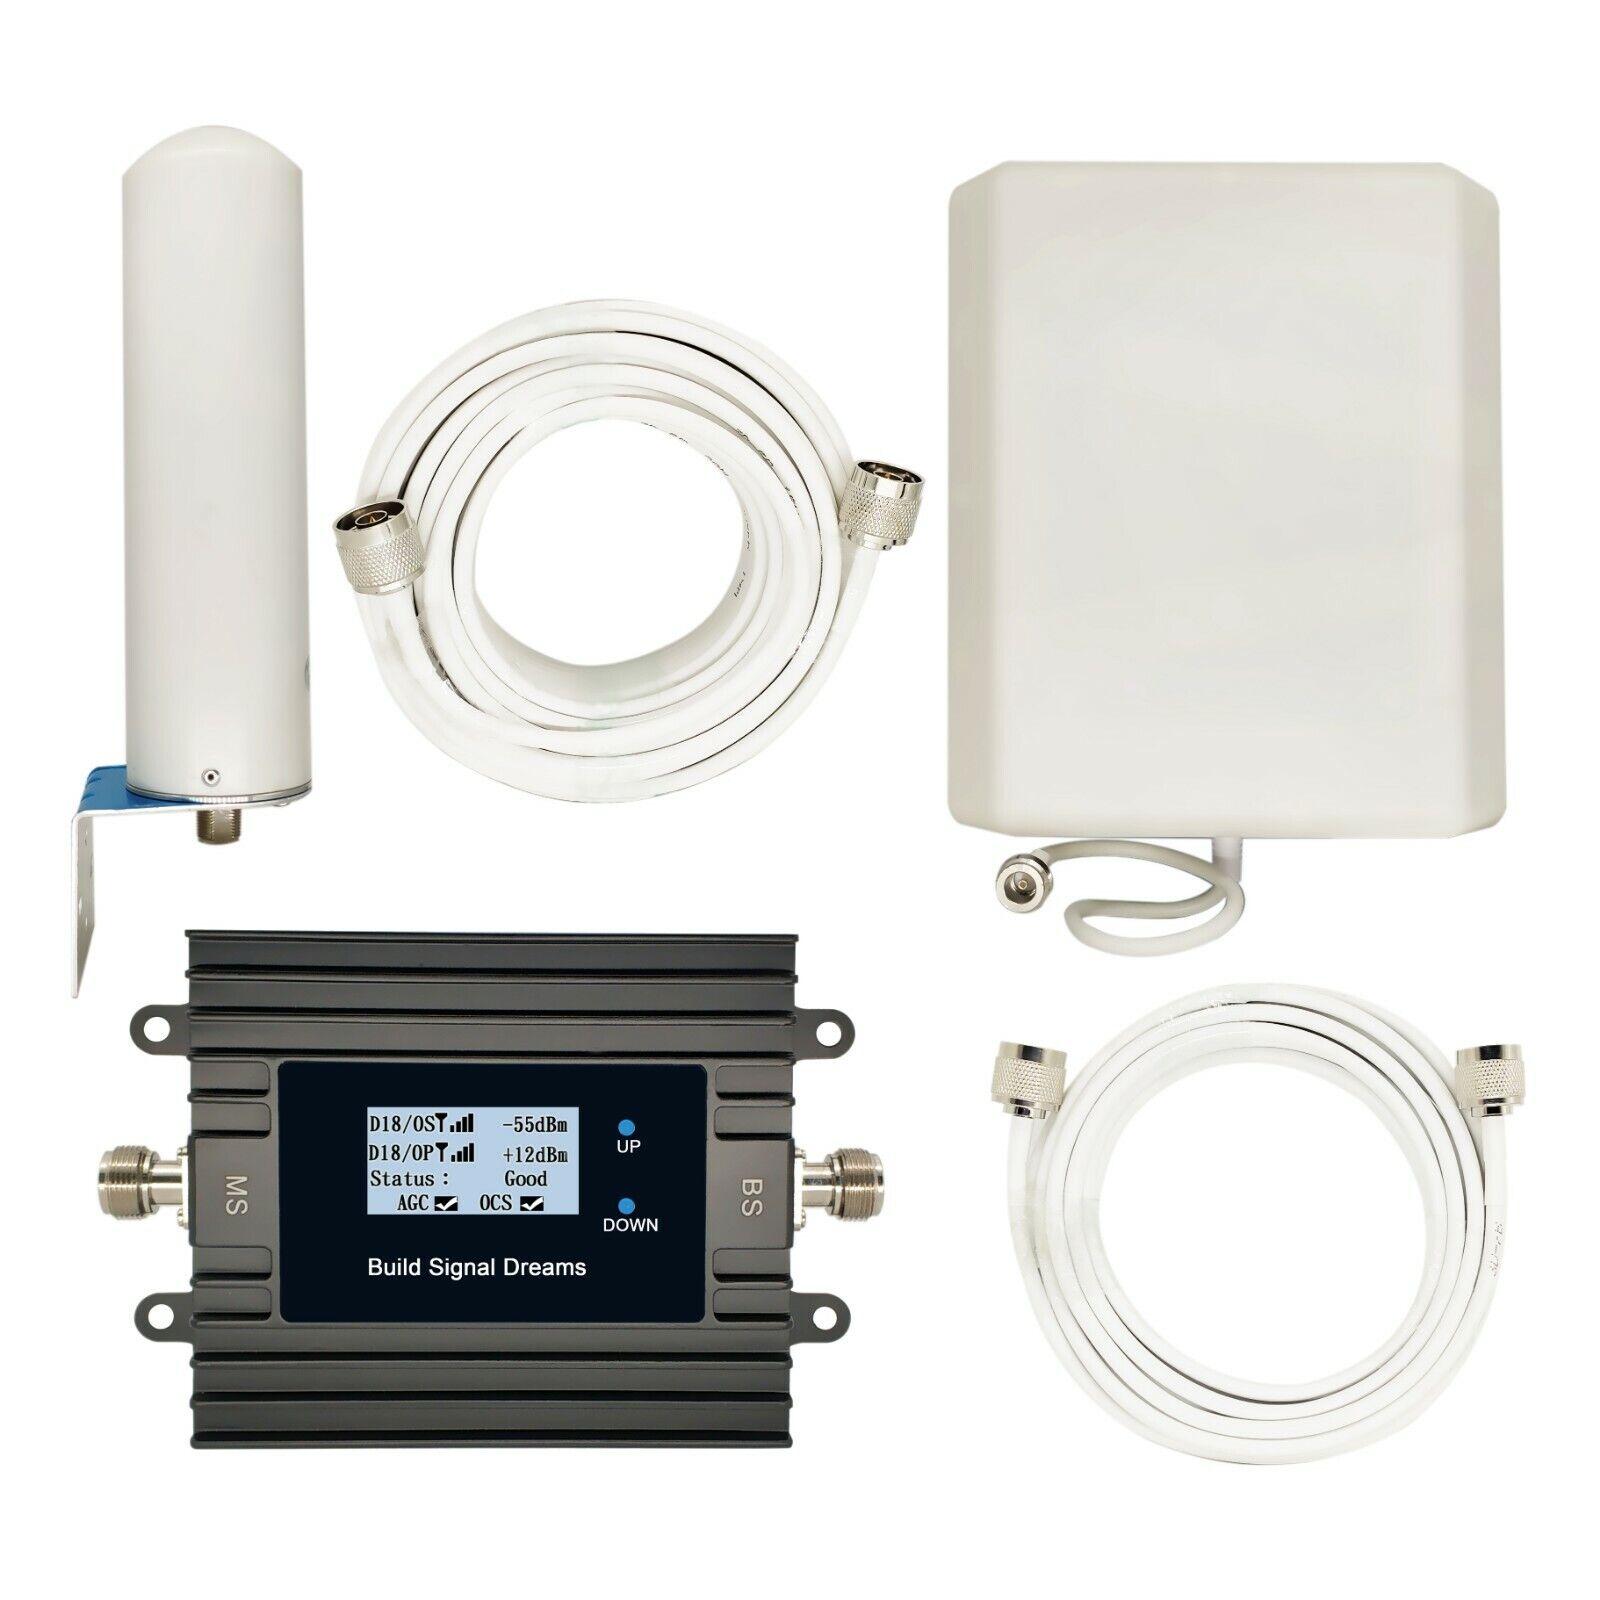 Smart LCD Signal Booster 4G Improve LTE700 Data AT&T Verizon